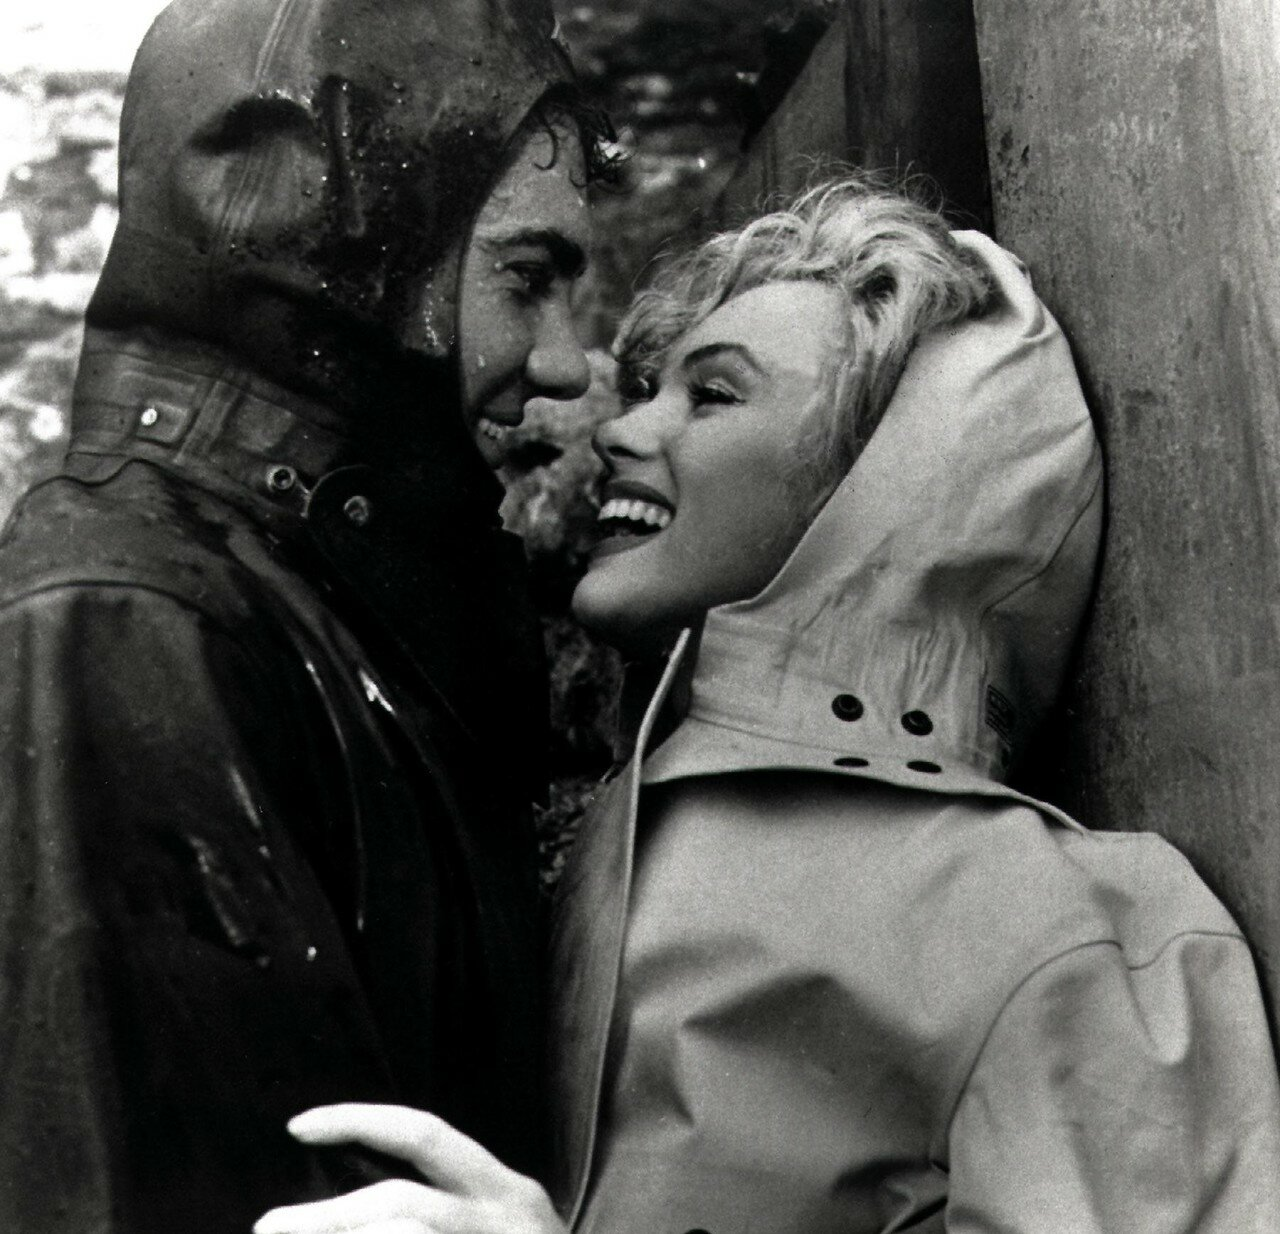 Niagara - Richard Allen, Marilyn Monroe